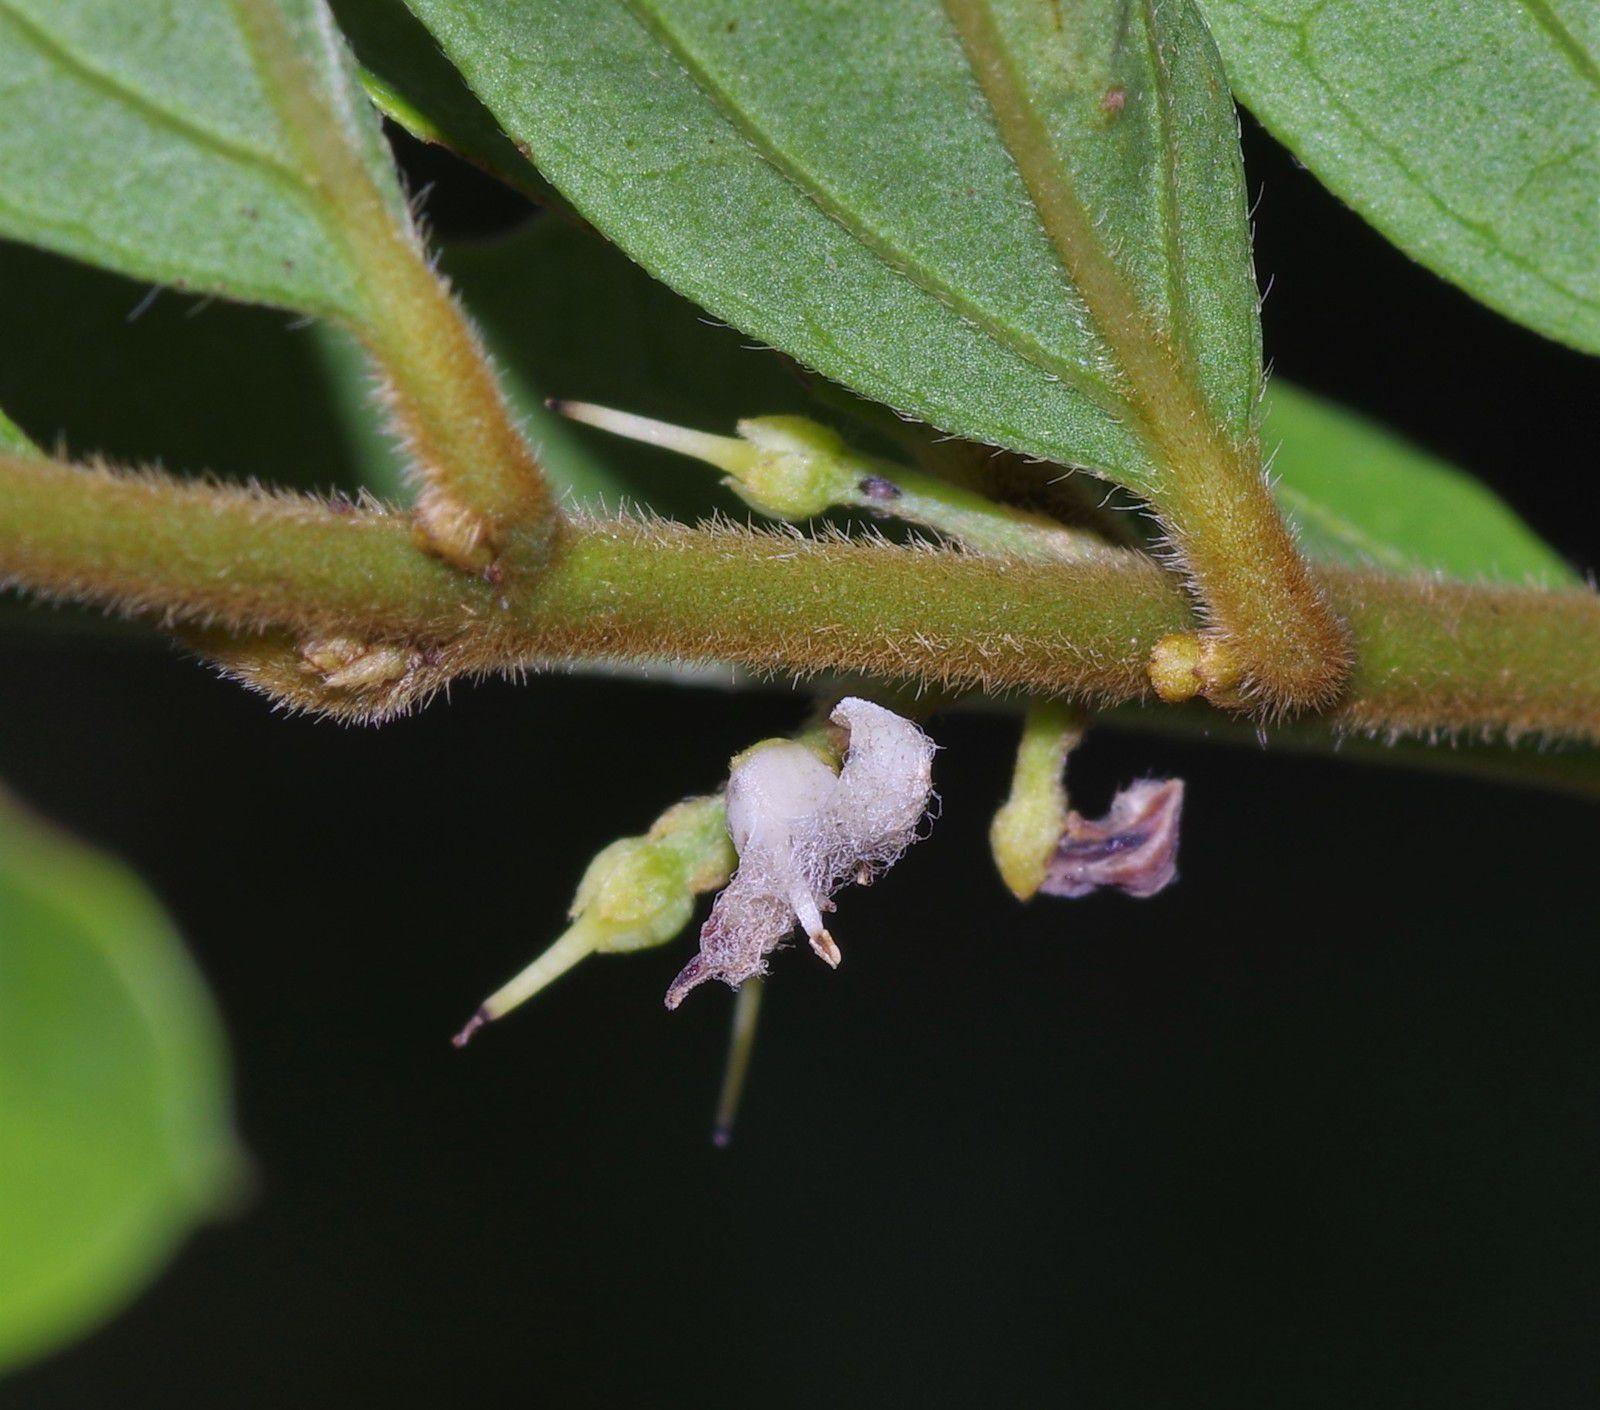 Strychnos panurensis